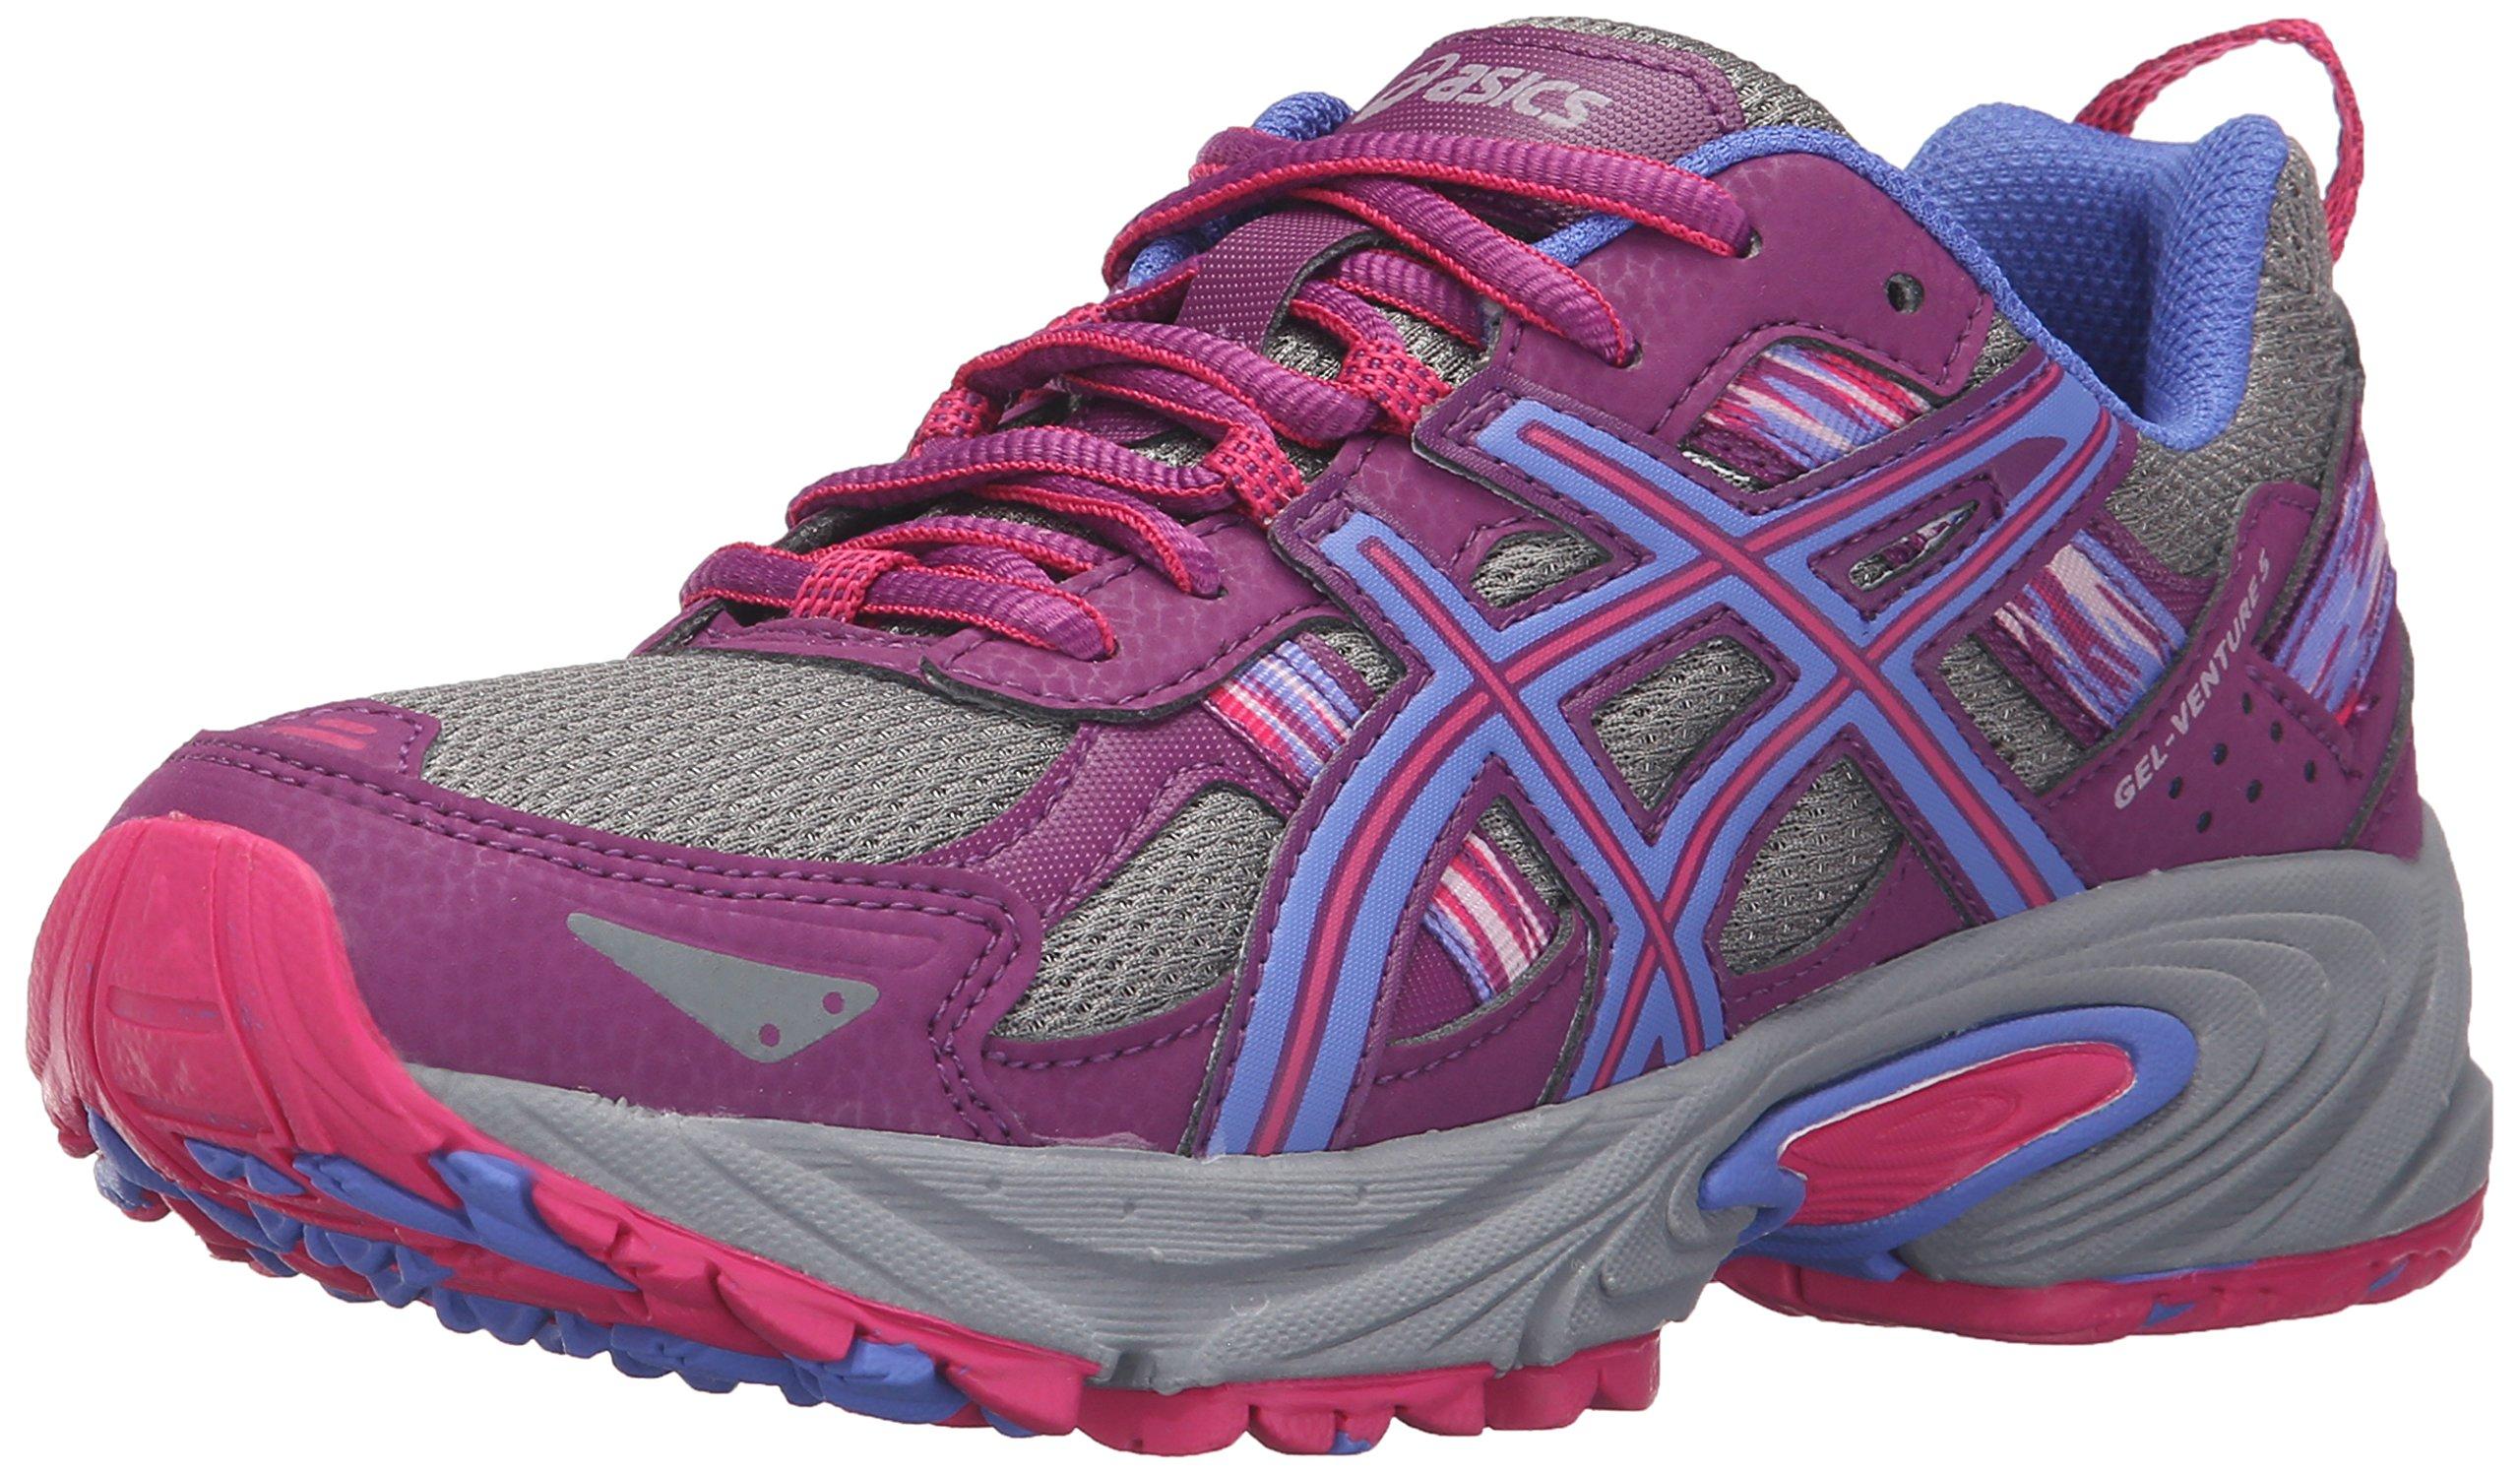 ASICS Women's Gel-Venture 5 Trail Runner, Phlox/Sport Pink/Aluminum, 10 M US by ASICS